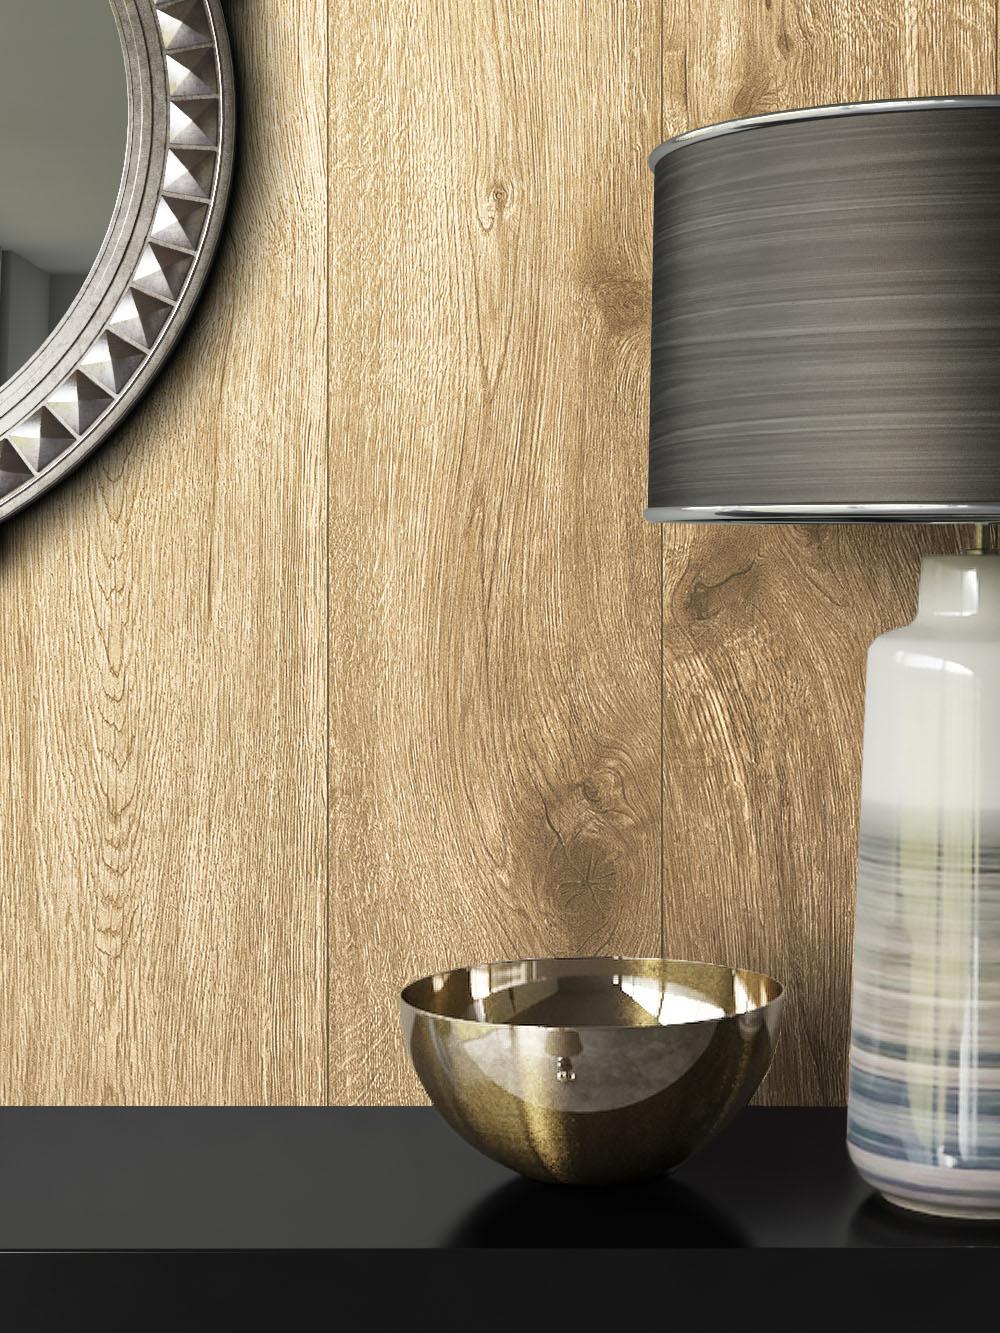 schlafzimmer tapeten holzoptik schlafzimmer teppich ideen deko feng shui lattenroste g nstig. Black Bedroom Furniture Sets. Home Design Ideas